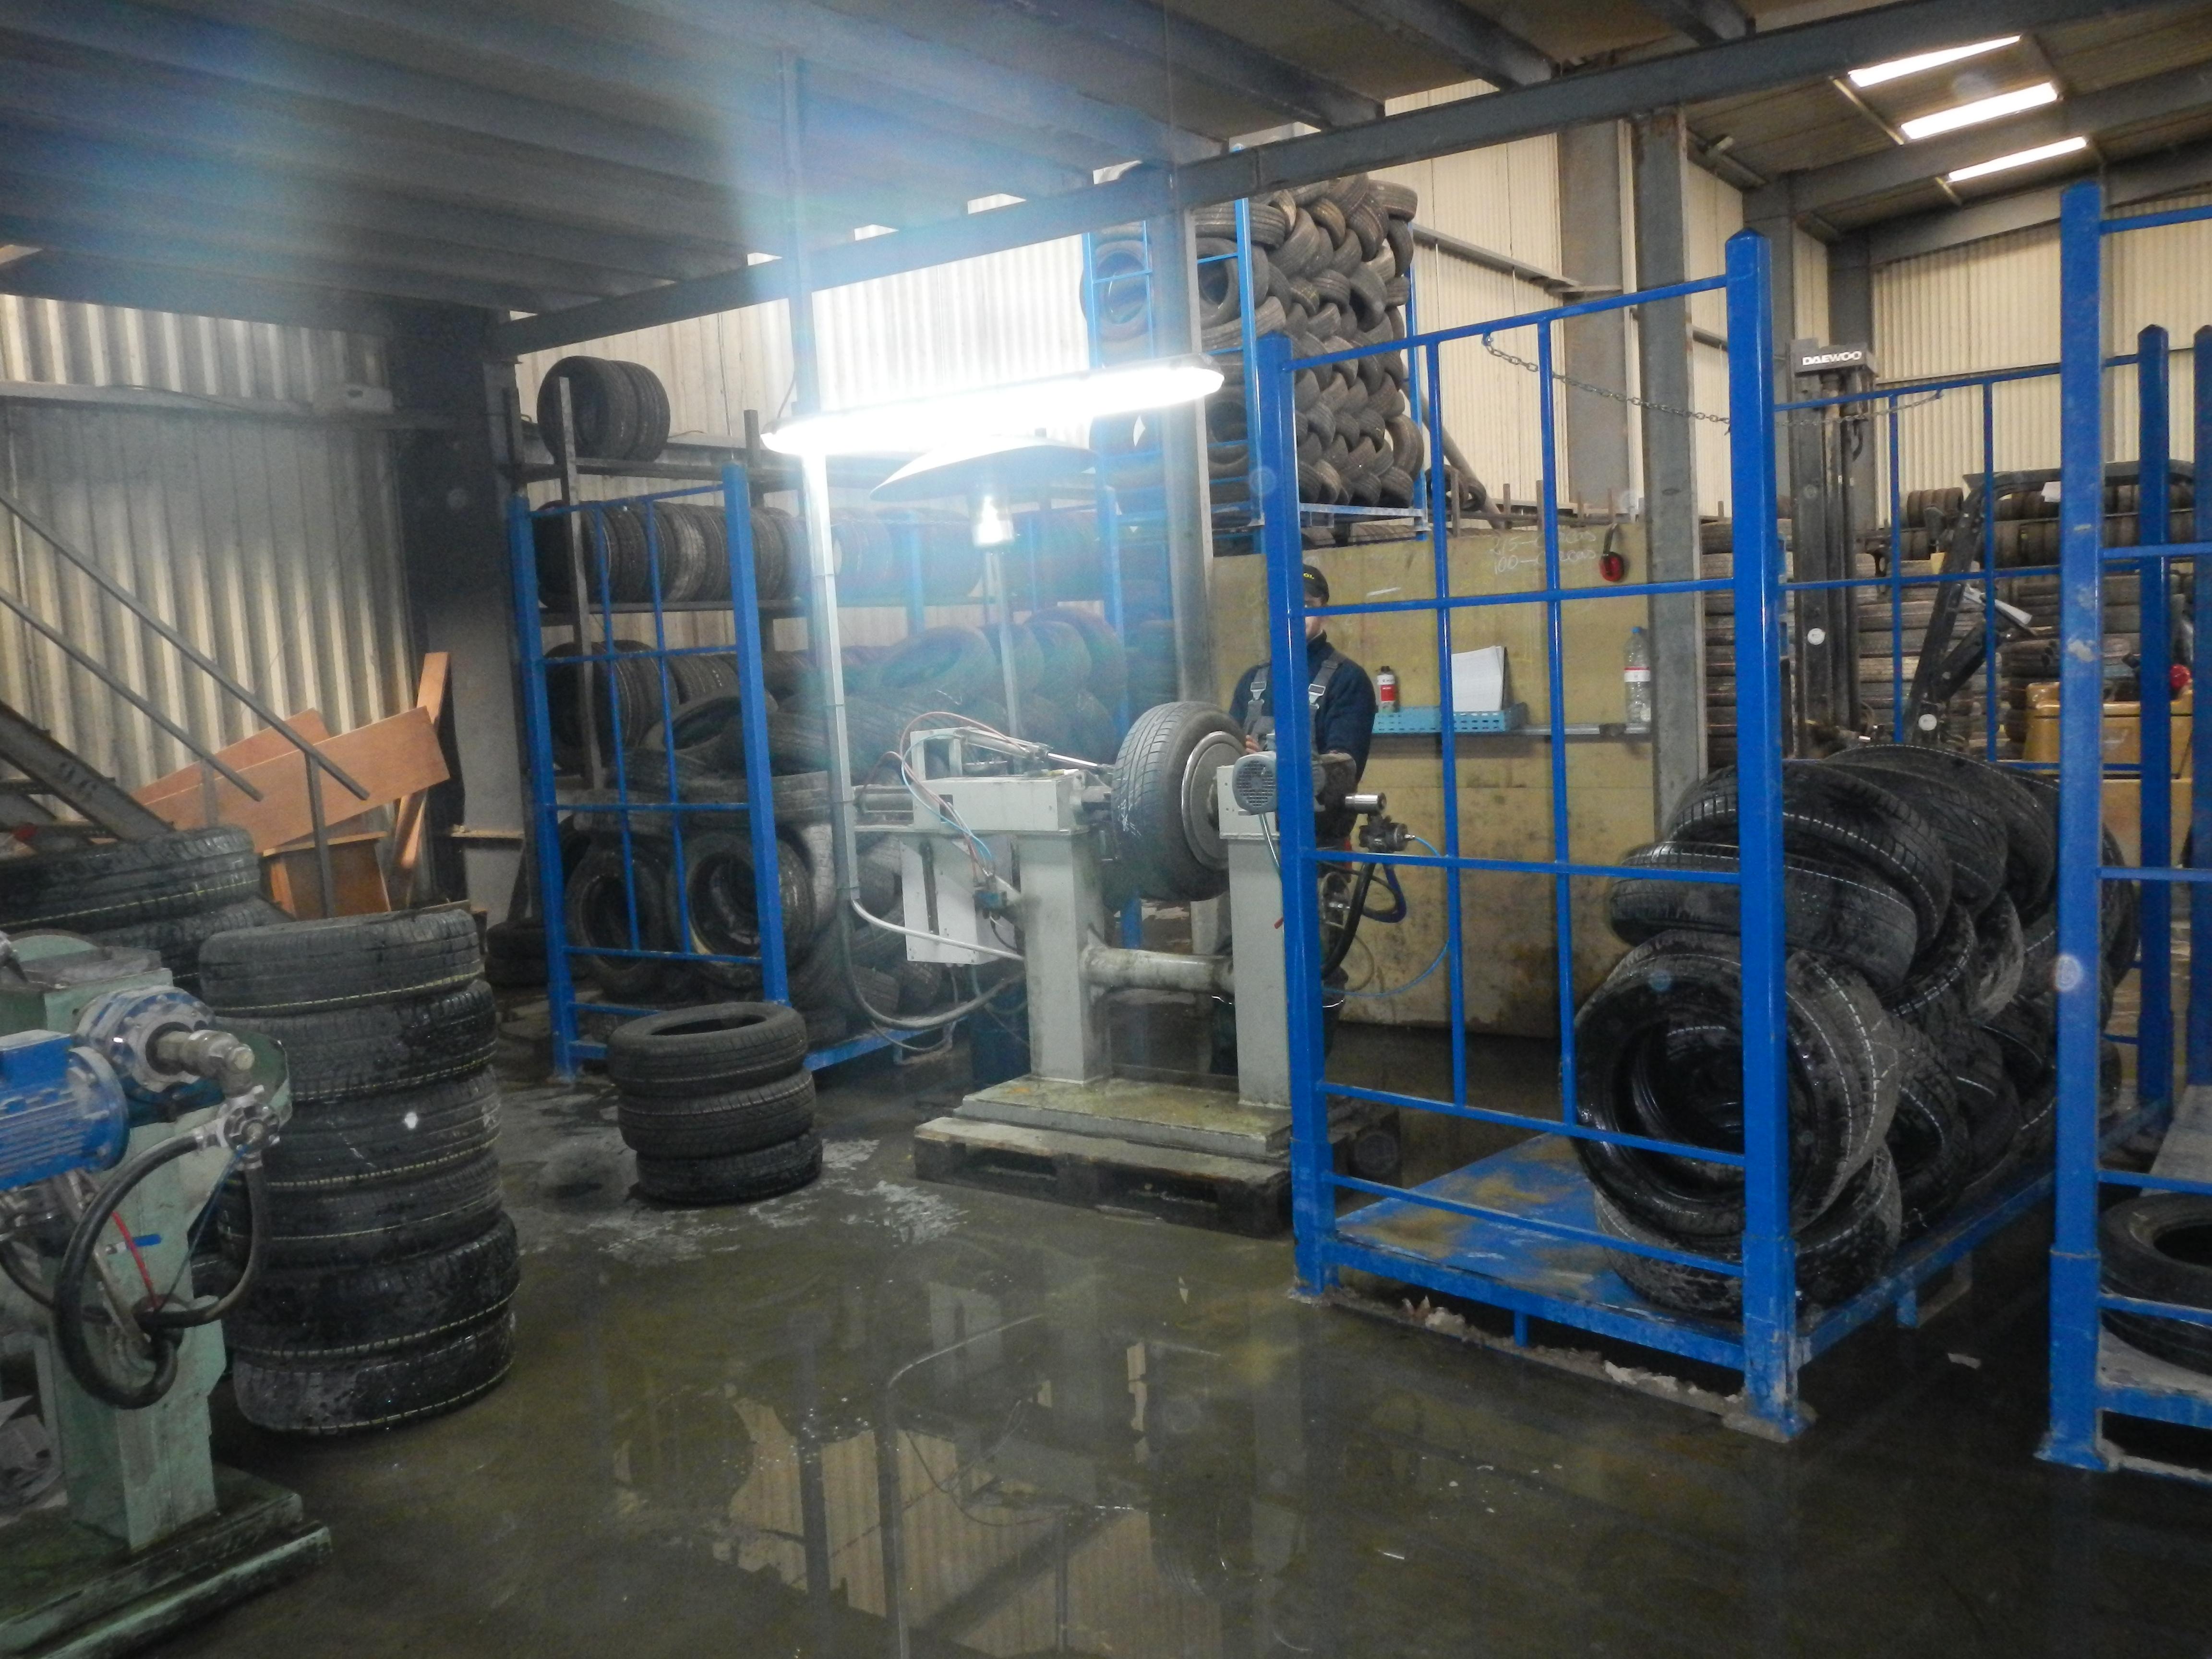 grossiste pneu occasion import export pneu occasion. Black Bedroom Furniture Sets. Home Design Ideas